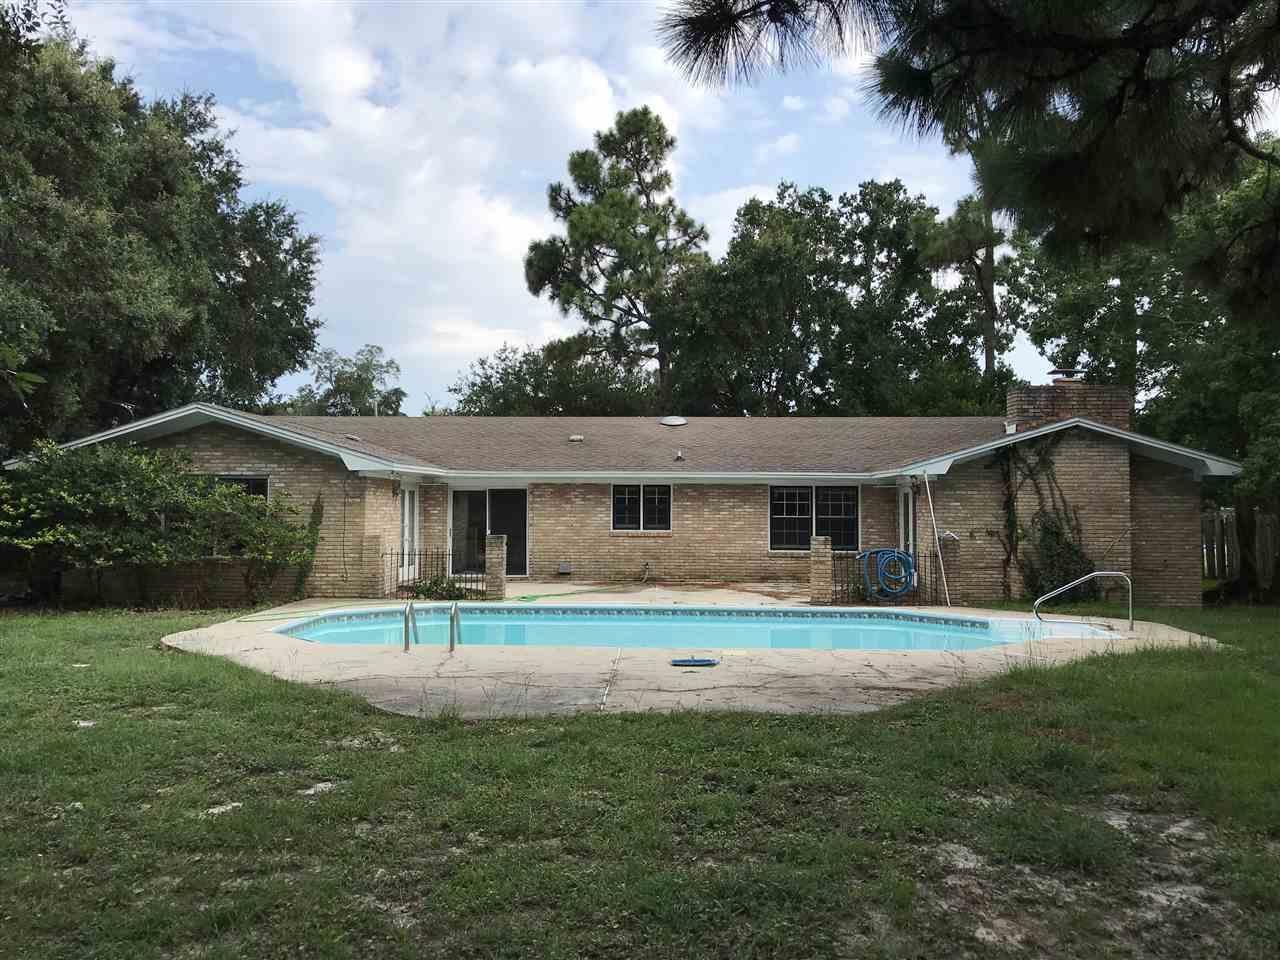 2912 Glenn St, Gulf Breeze, FL 32563